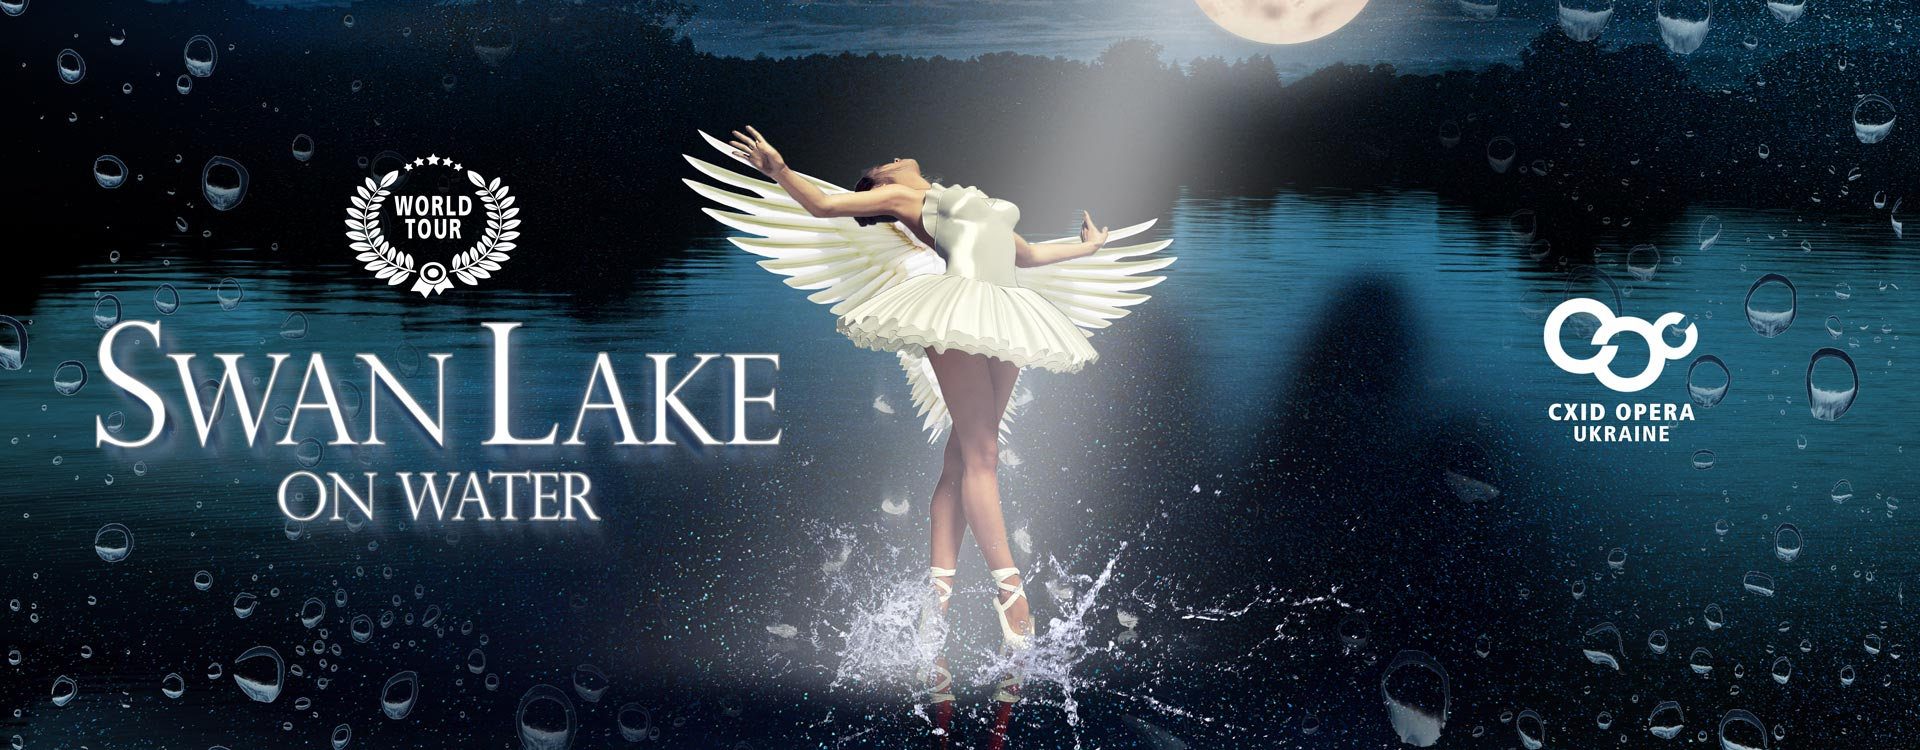 Swan lake on water, World TOUR, Cxid Opera Ukraine